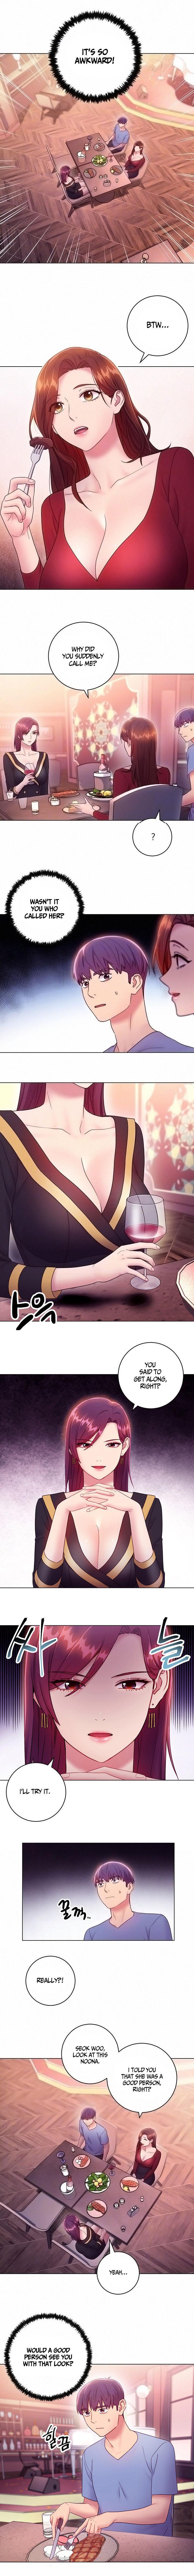 [Neck Pilllow] Stepmother Friends Ch.40/? [English] [Hentai Universe] NEW! 22/10/2020 328